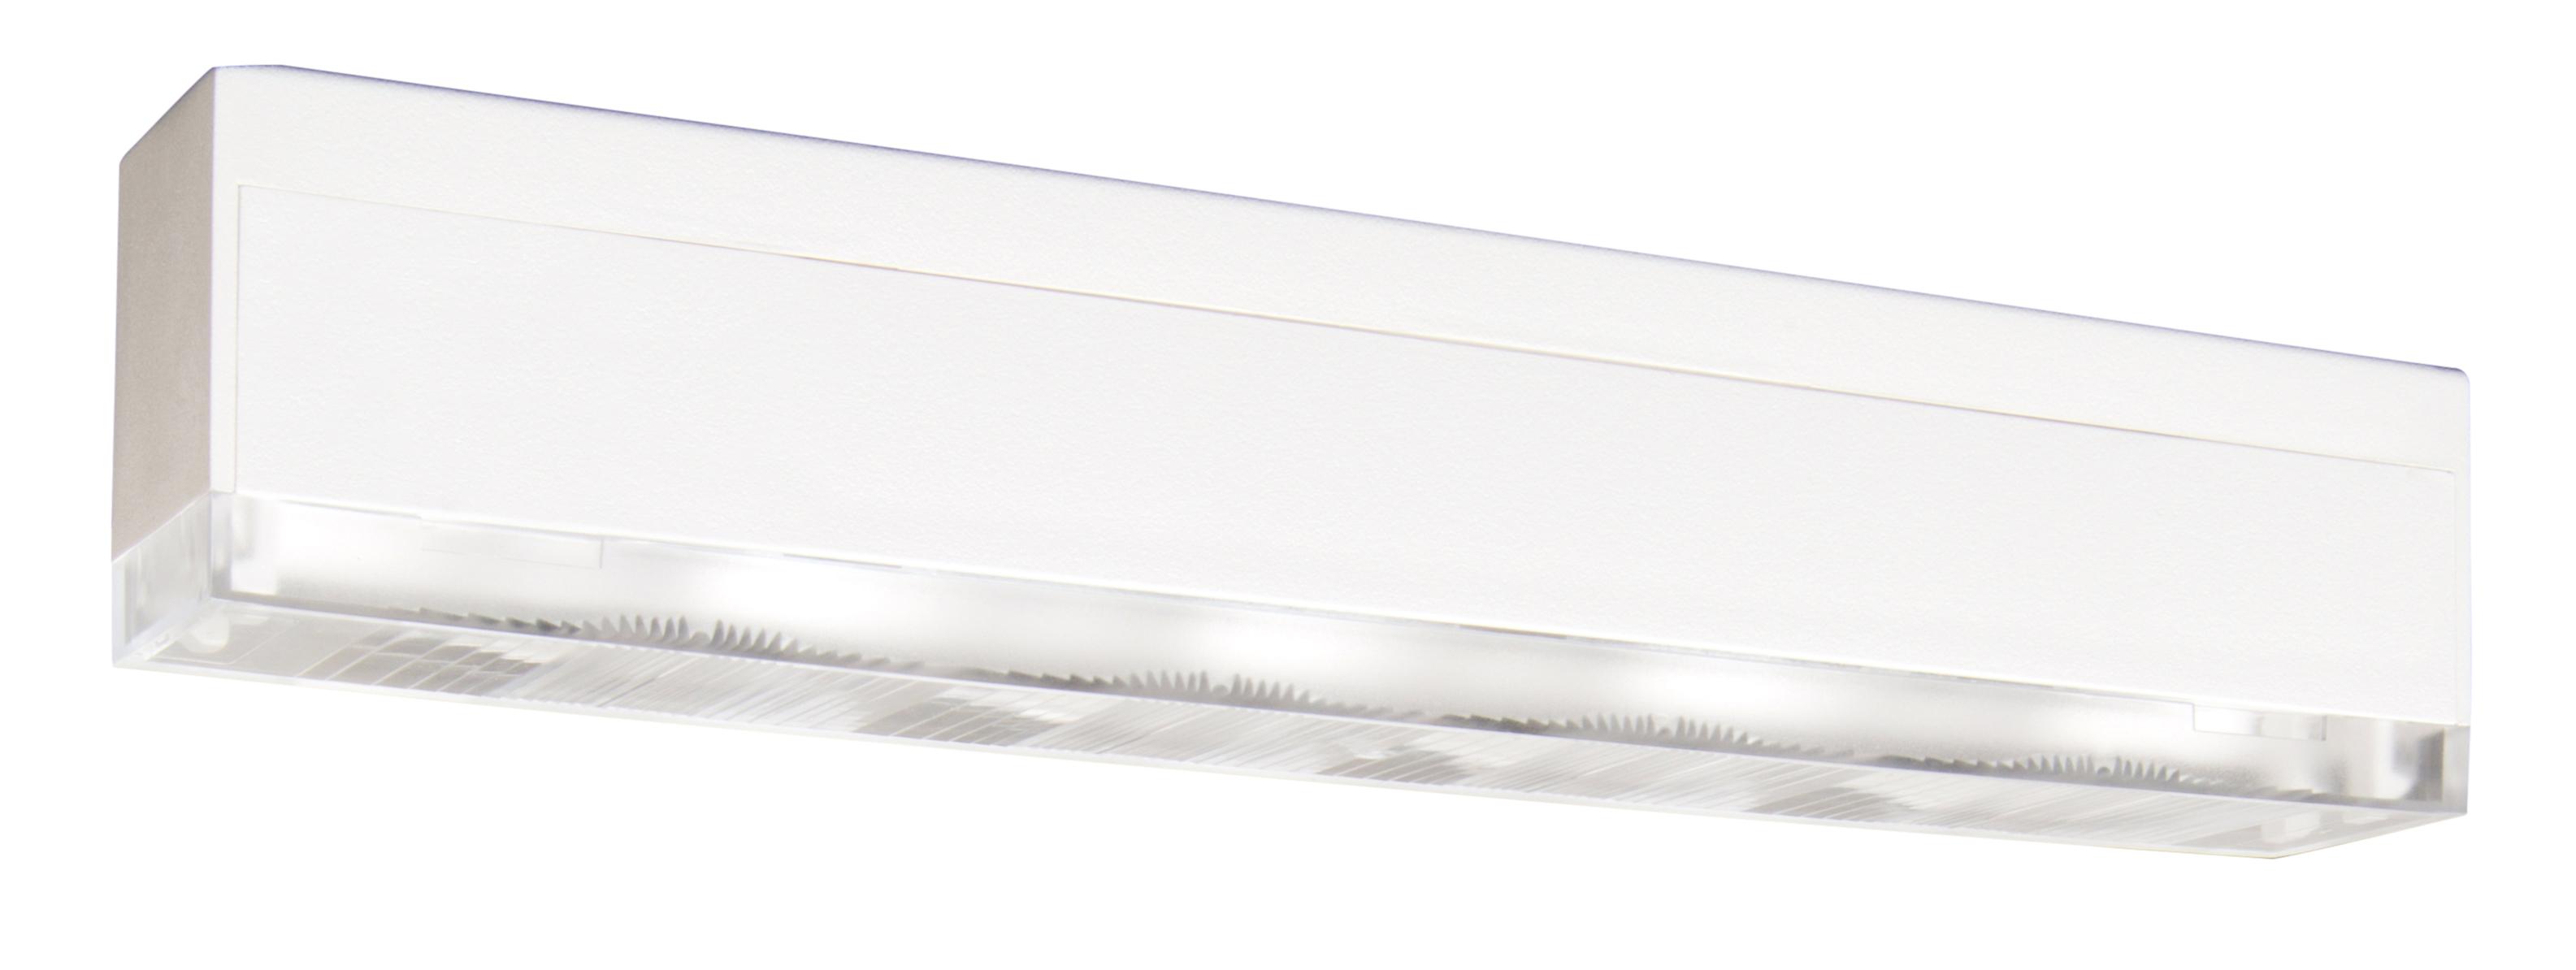 1 Stk Notleuchte KMB Wireless LED 3h 230VAC, per Funk schaltbar NLKMB003WL